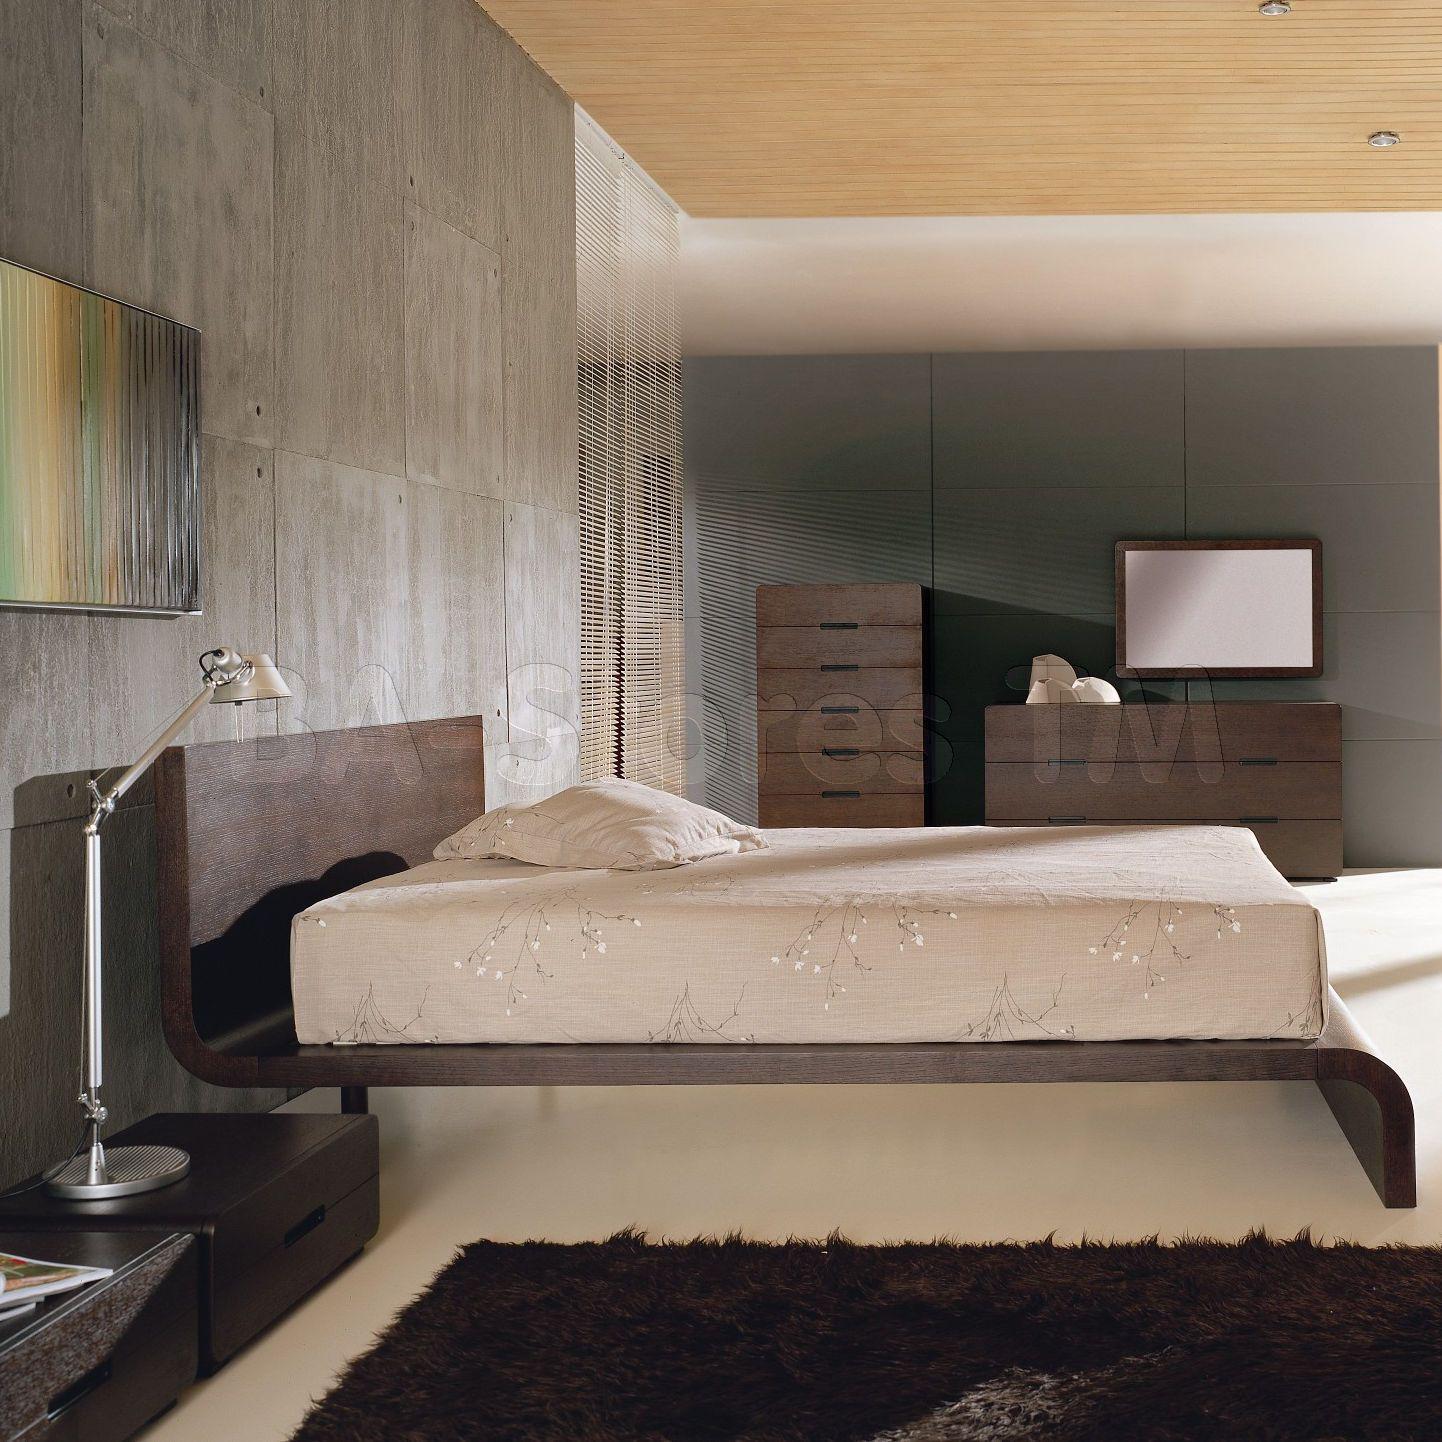 Cosmo 5 Pcs Bedroom Set In Wenge Bed 2 Nightstands Dresser And Mirror Beverly Hills Furniture Inc